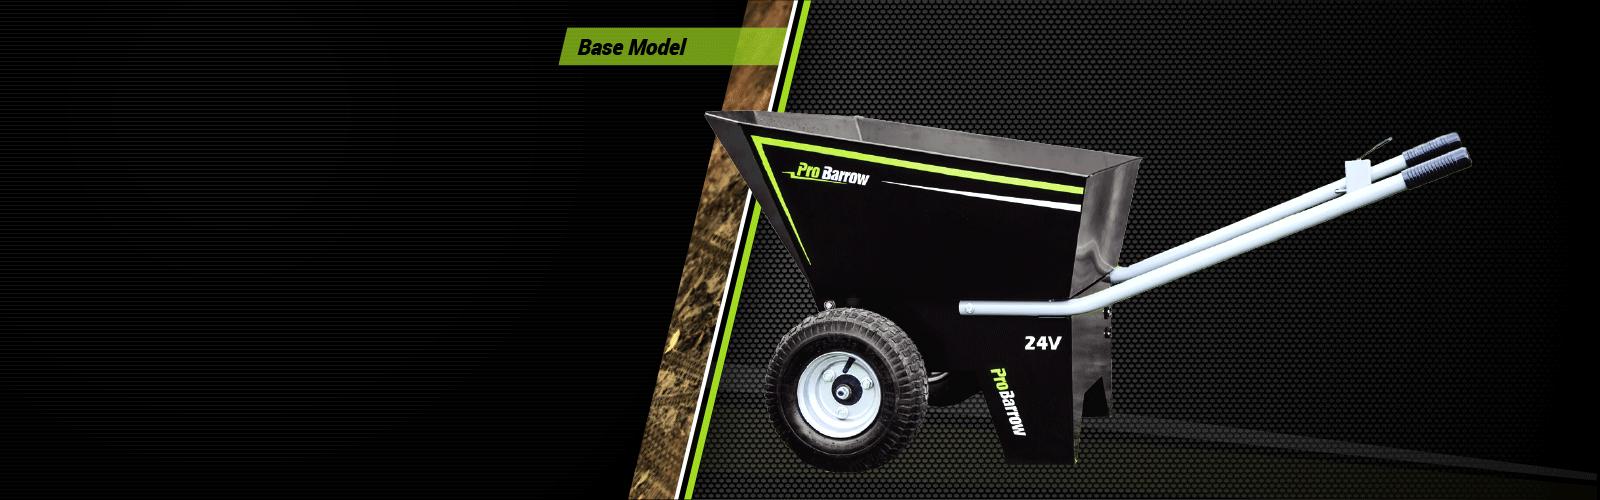 base-model